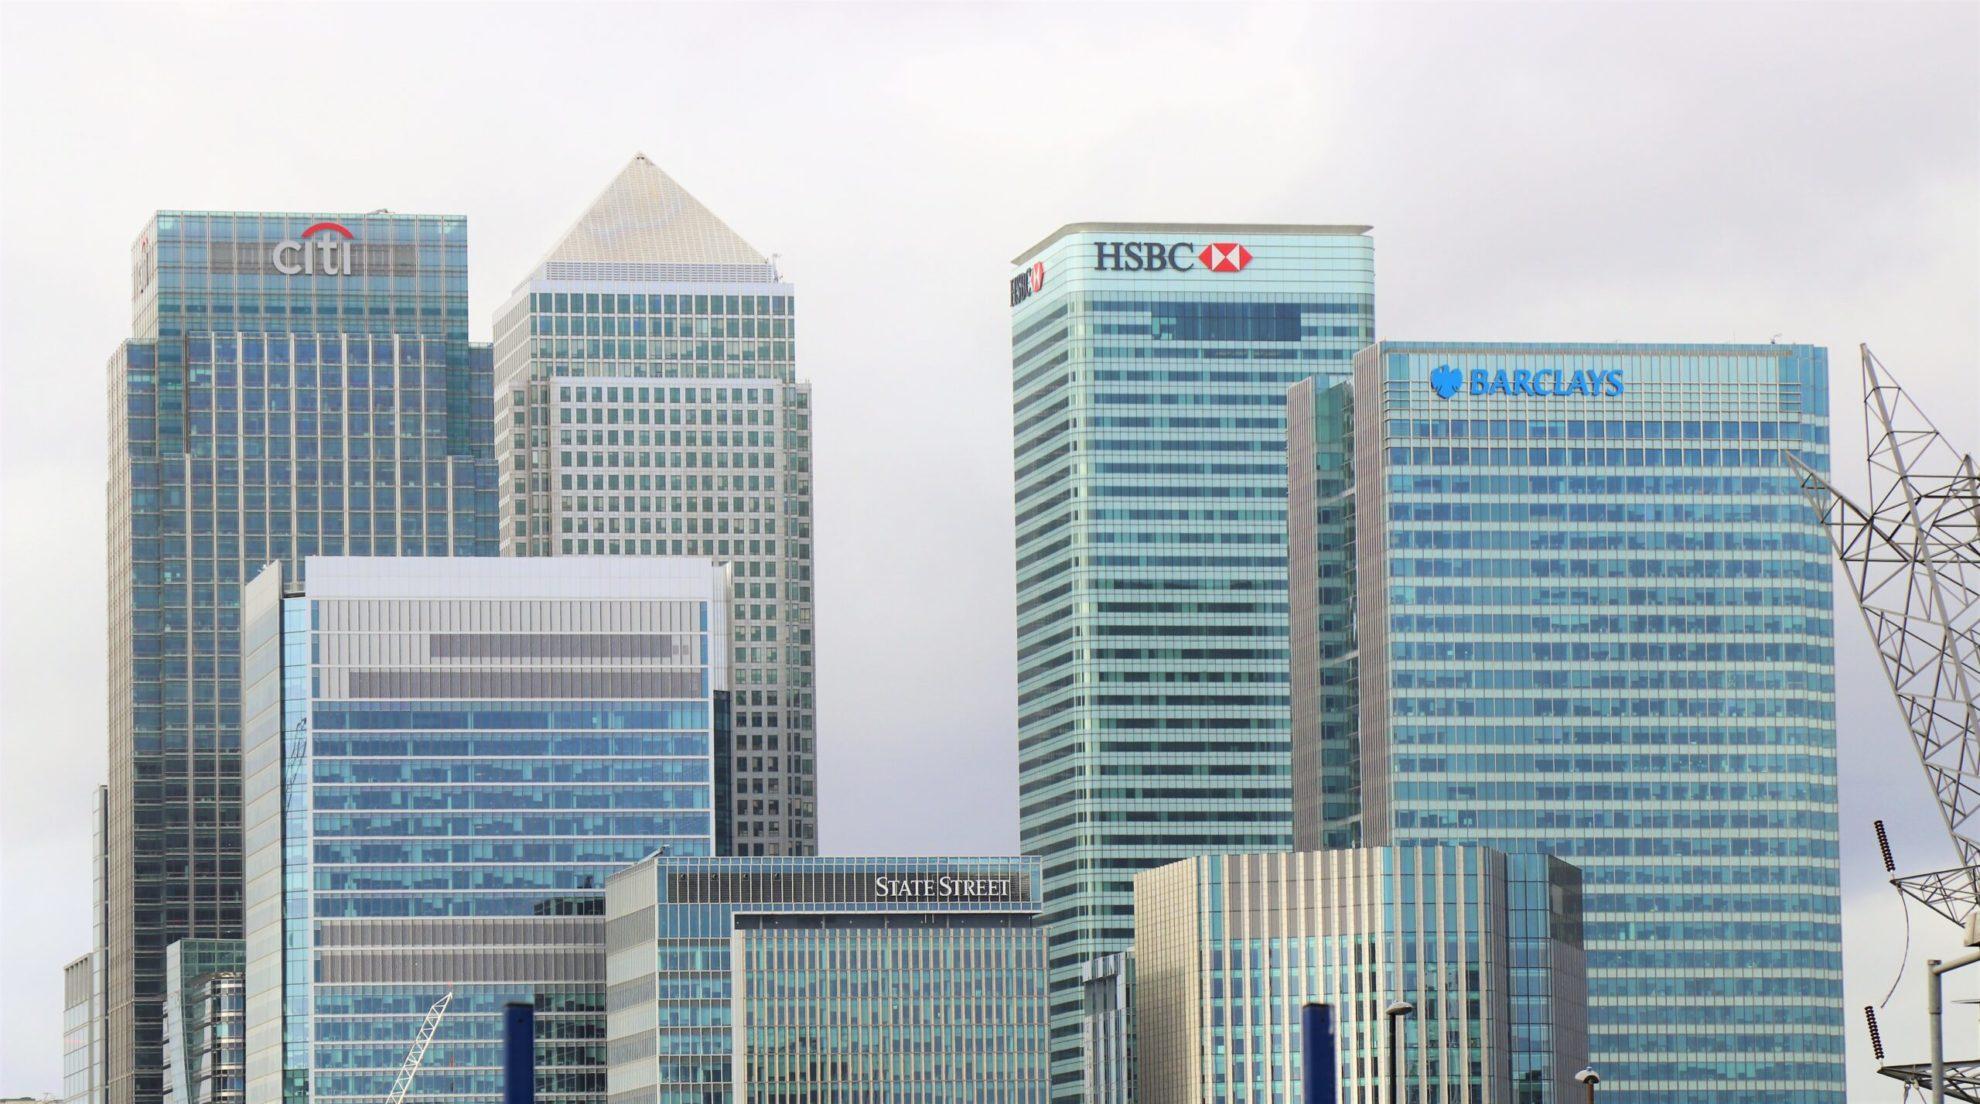 soft skills training banks UK Motem